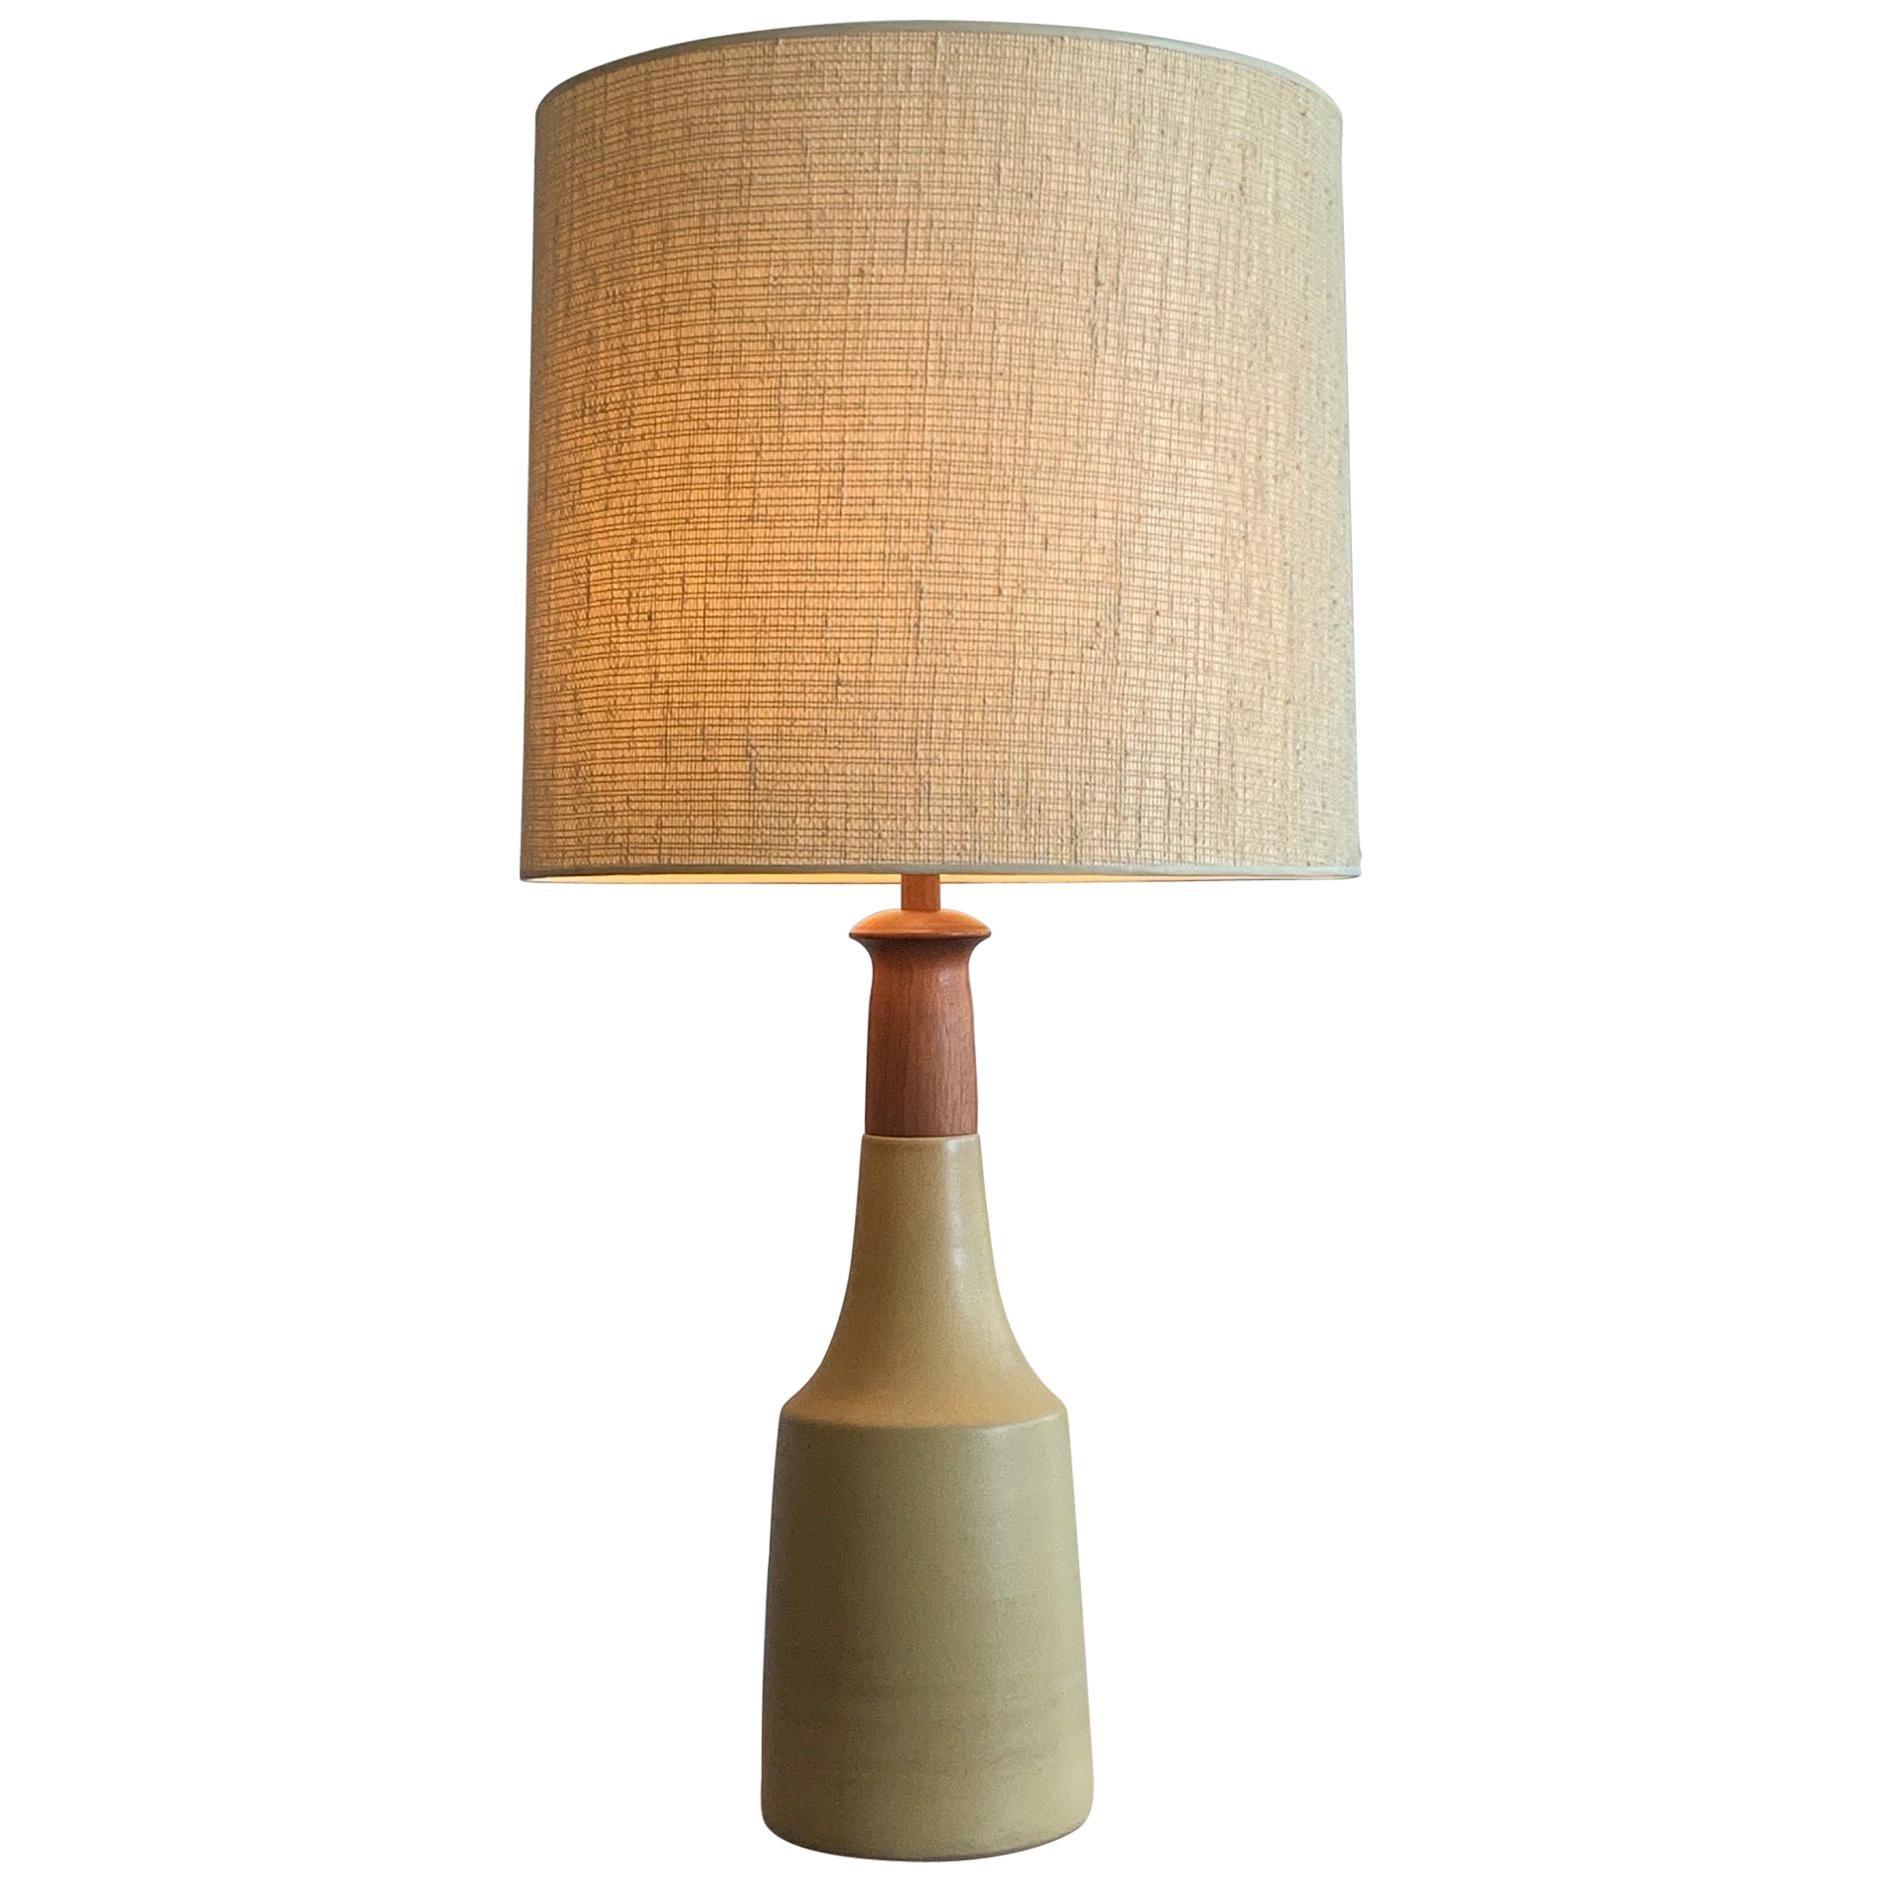 Large Ceramic Lamp by Martz